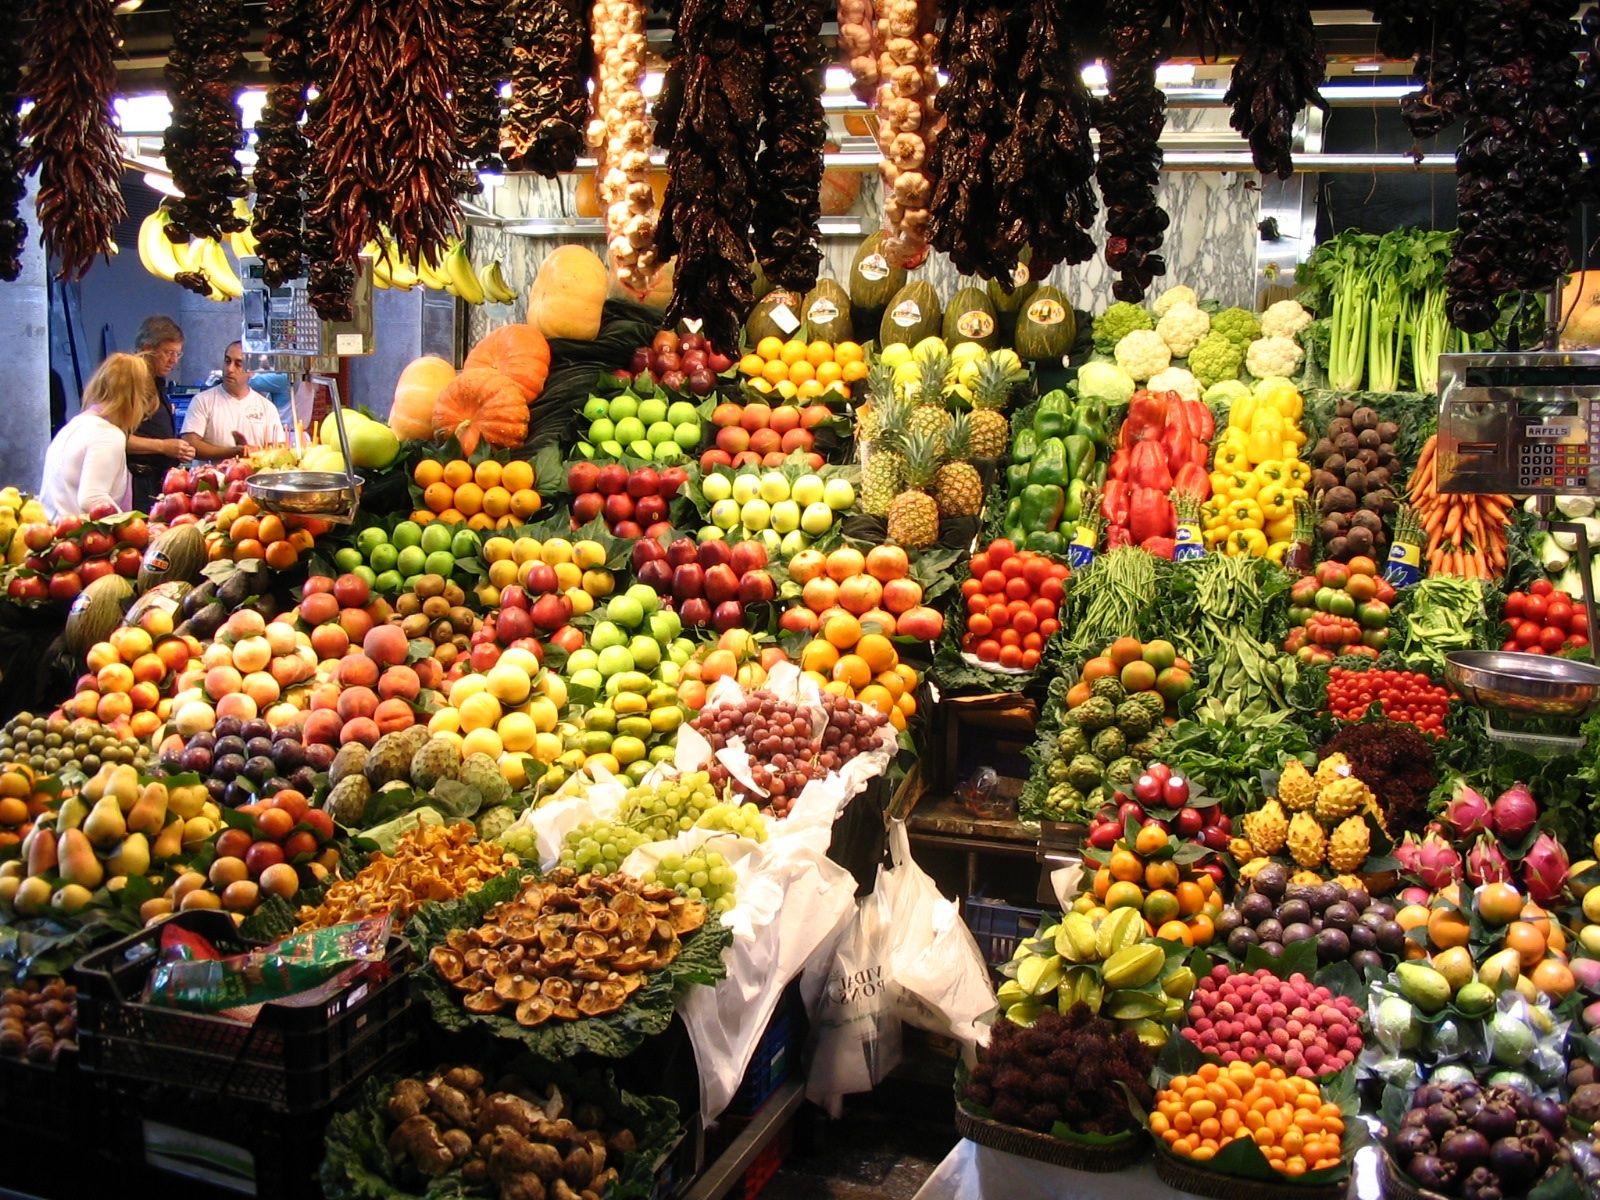 España sabe a variedad #saboreaespaña #tastingspain